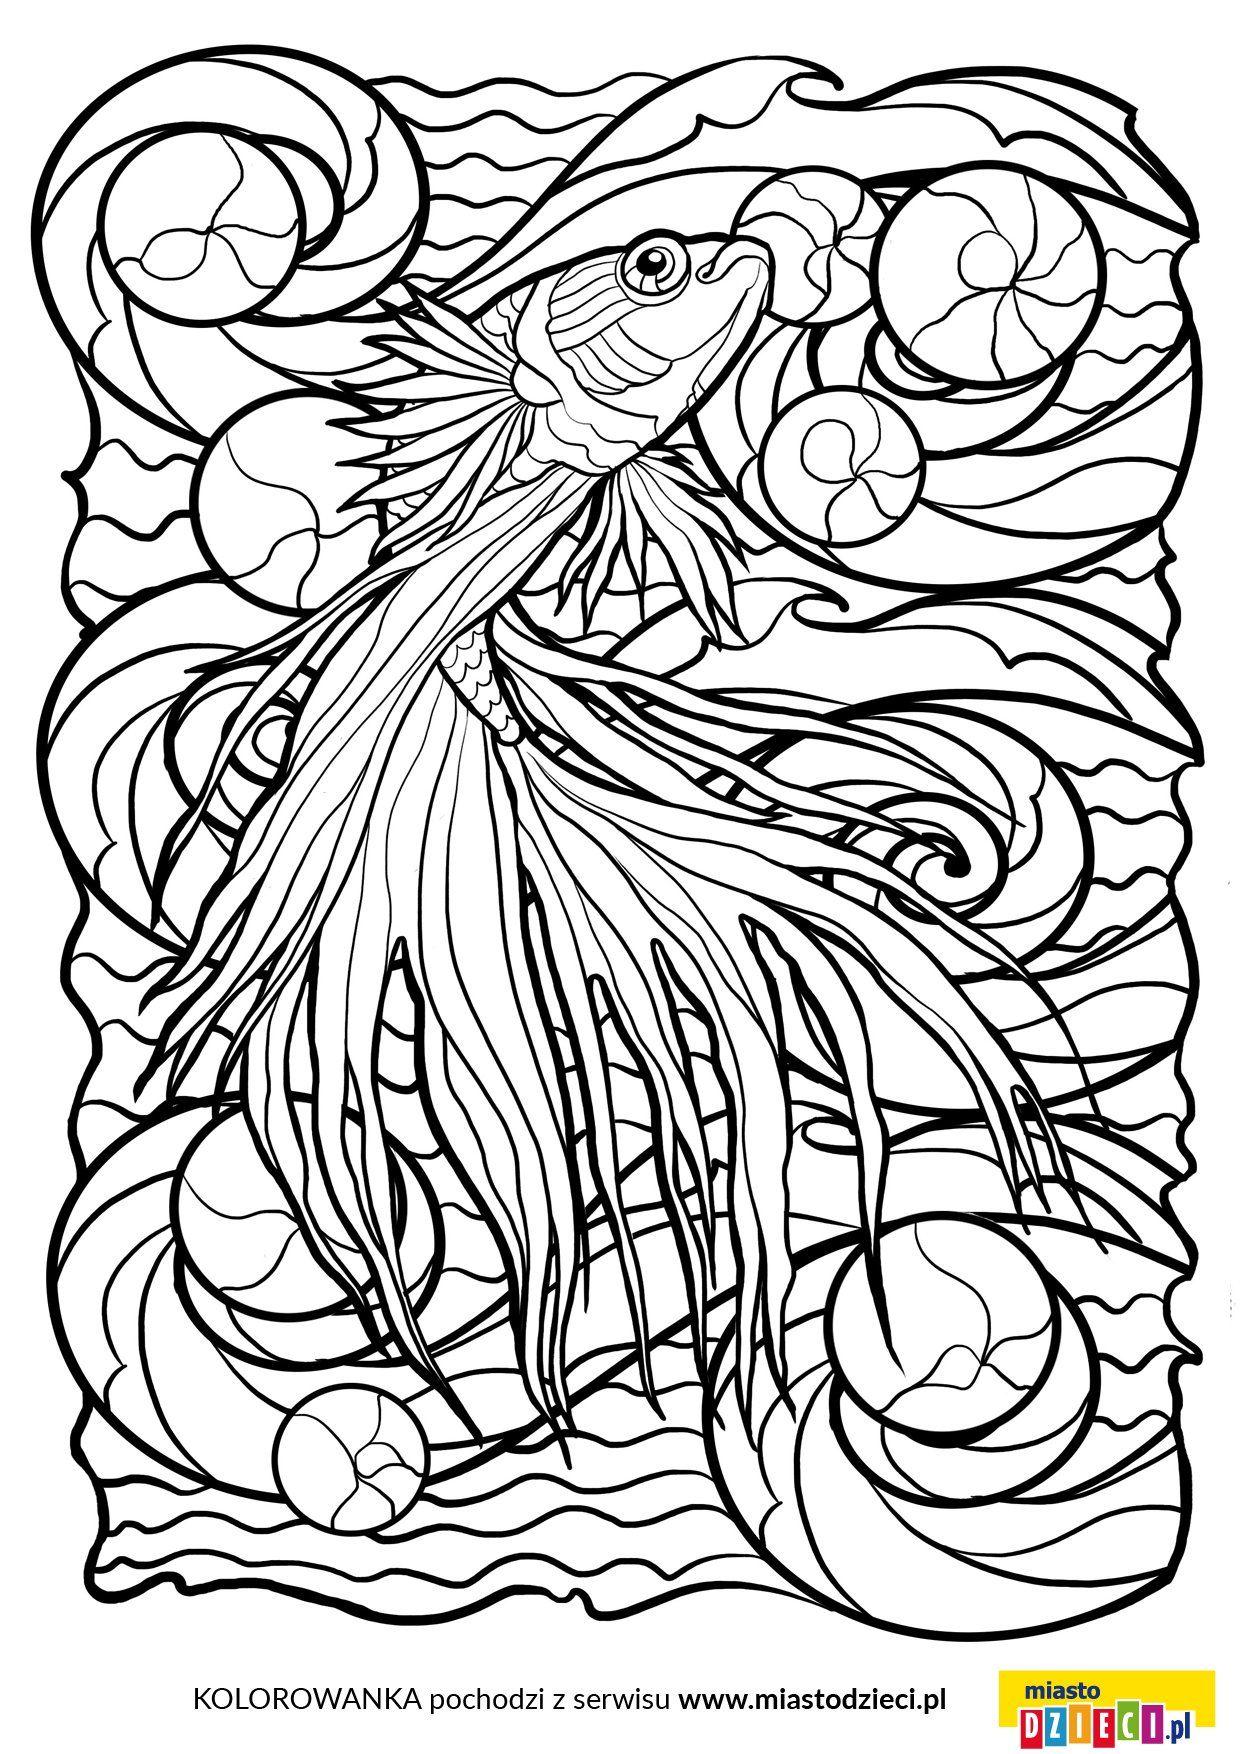 Kolorowanki Antystresowe Ryba Abstract Artwork Female Sketch Coloring Pages